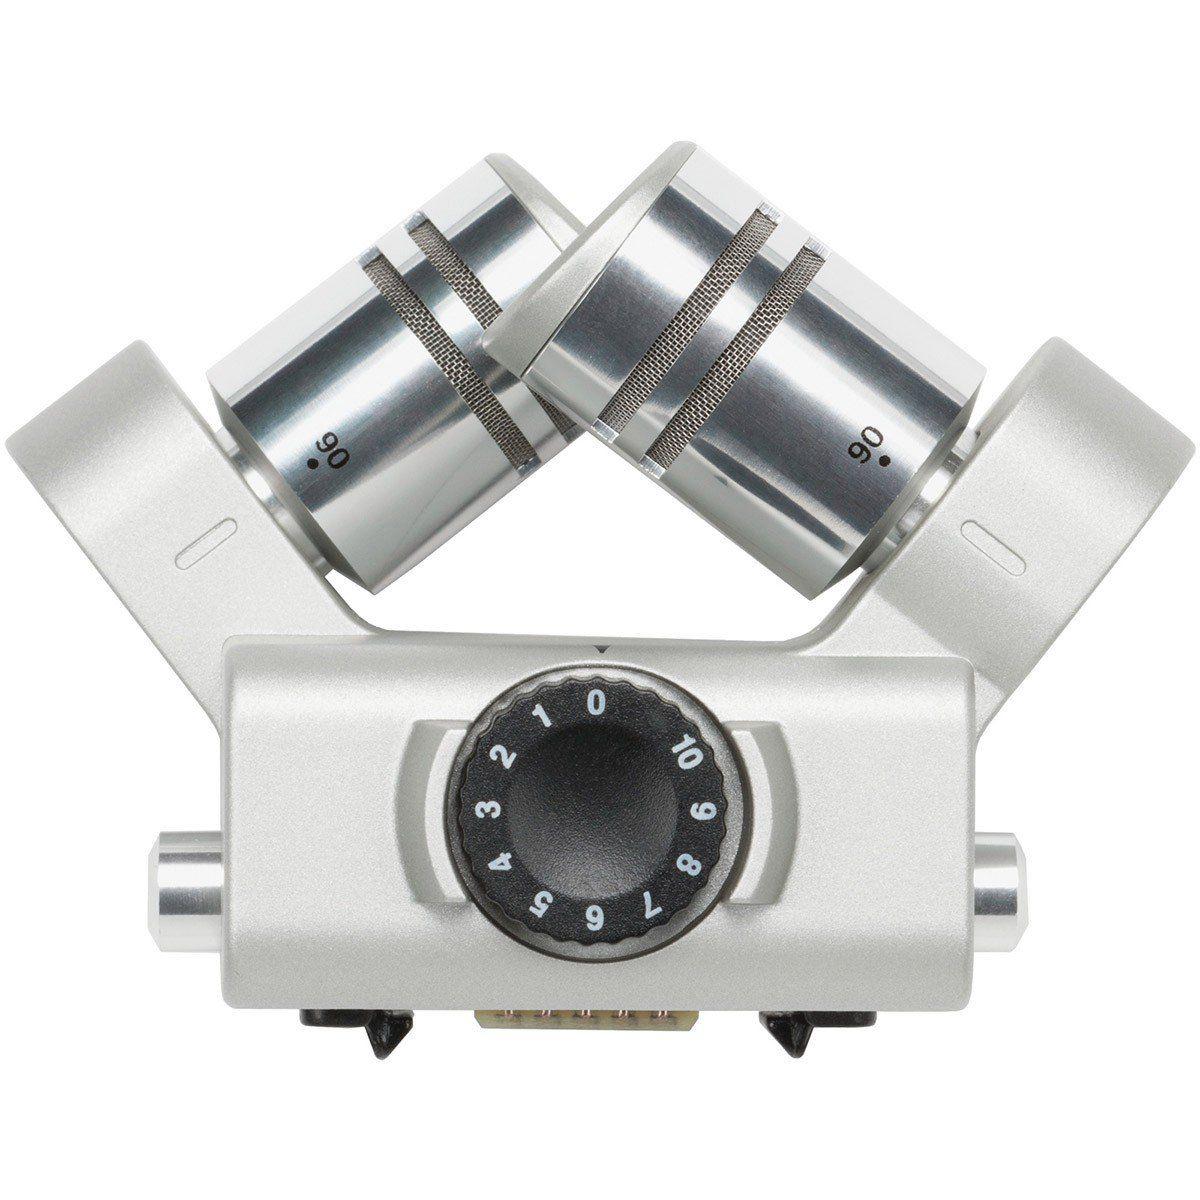 Zoom H6 Gravador De Áudio Zoom H 6 Armazena até 128GB Microfones Modulares 24-Bit